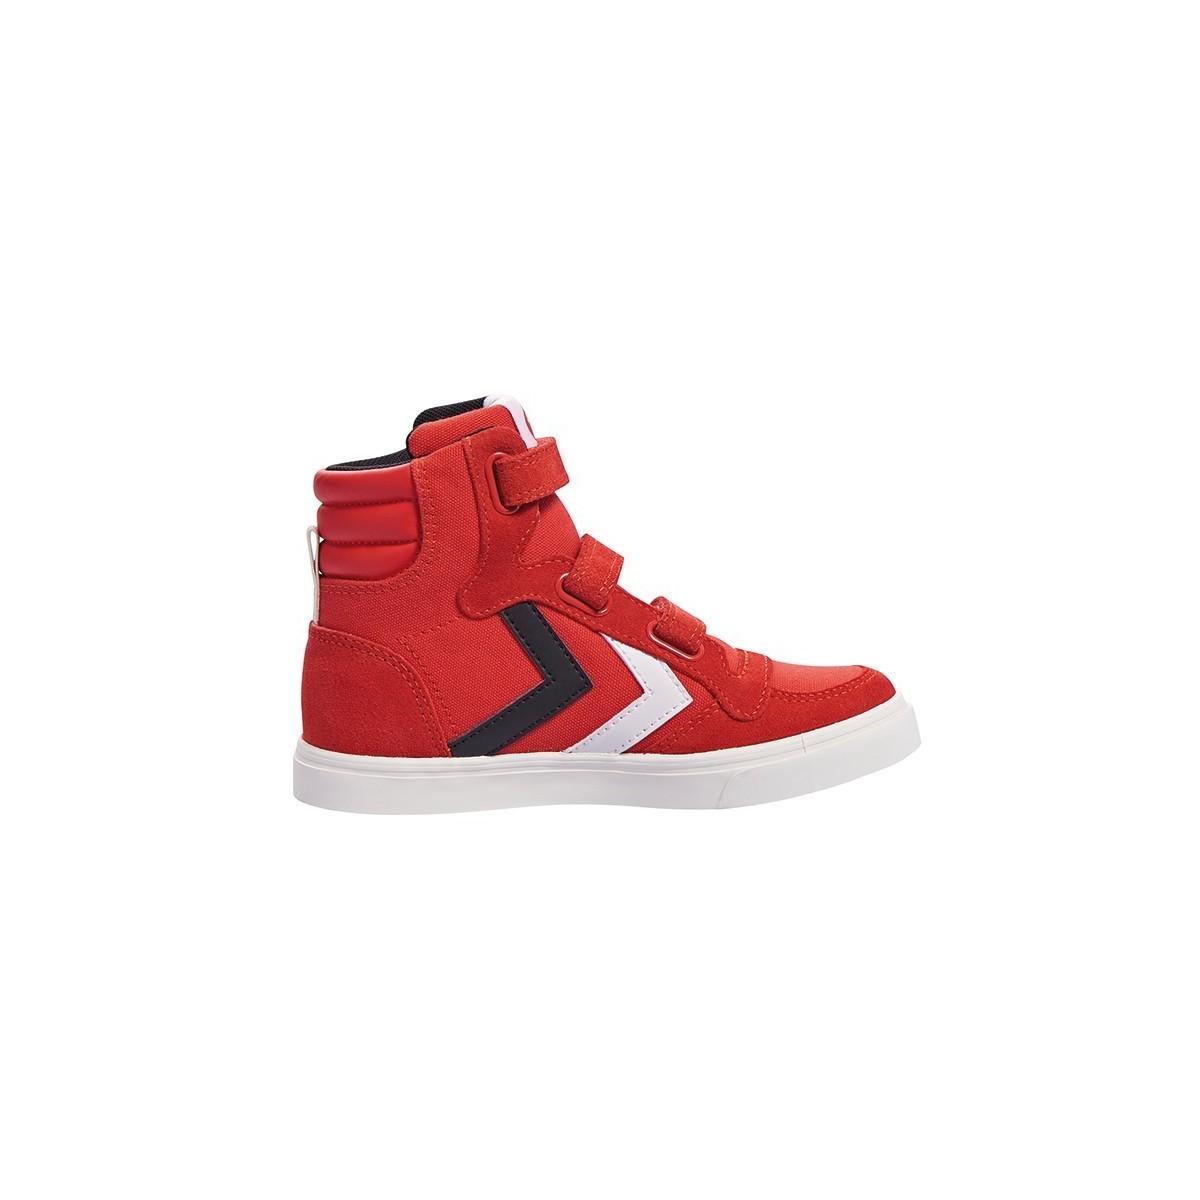 Basket haute Stadil canevas red